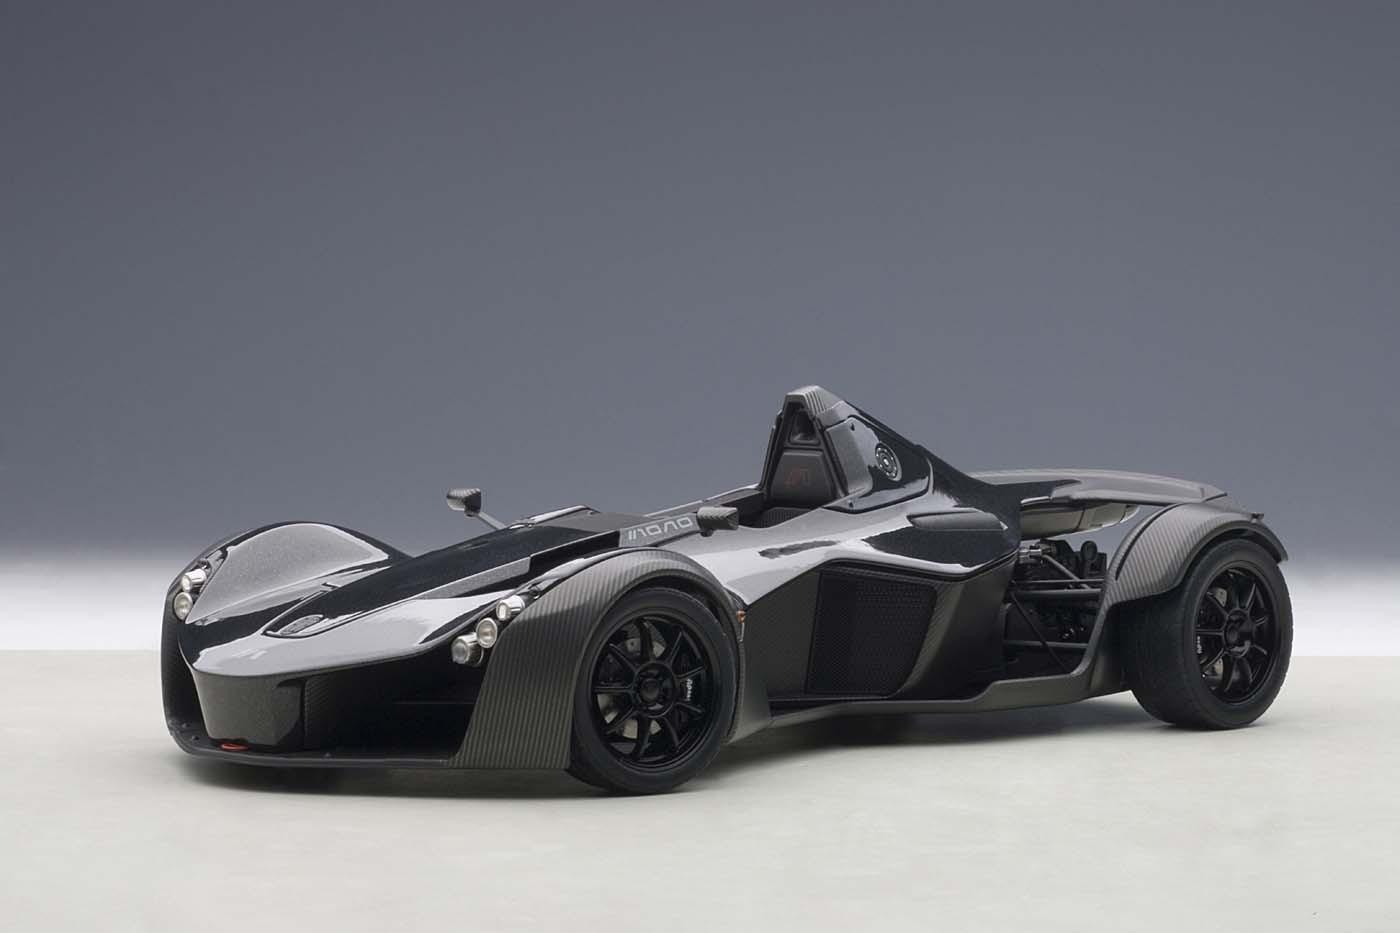 Bac Mono Price >> AUTOart Highly detailed die-cast model BAC Mono Metallic ...